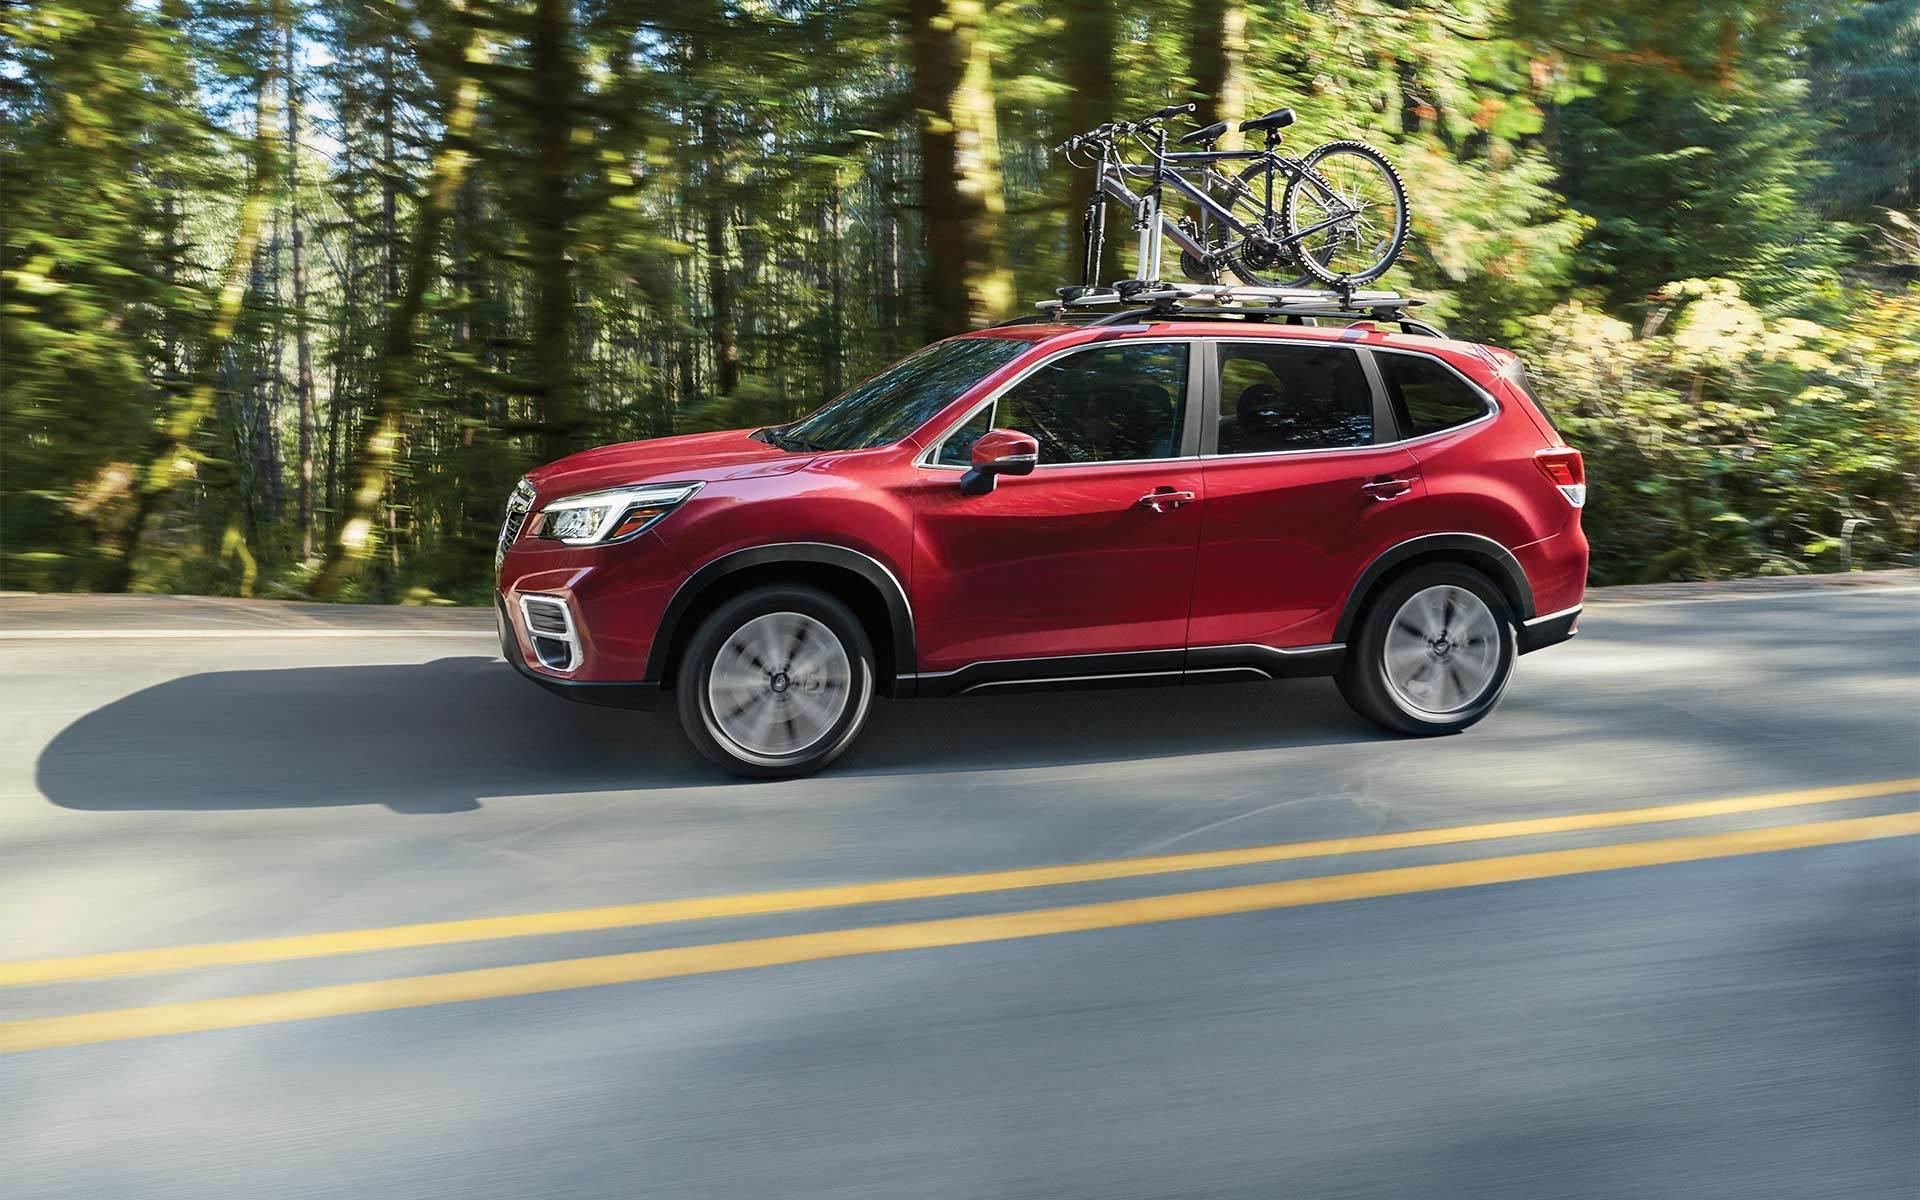 Test Drive the 2020 Subaru Forester near Eldorado Springs CO